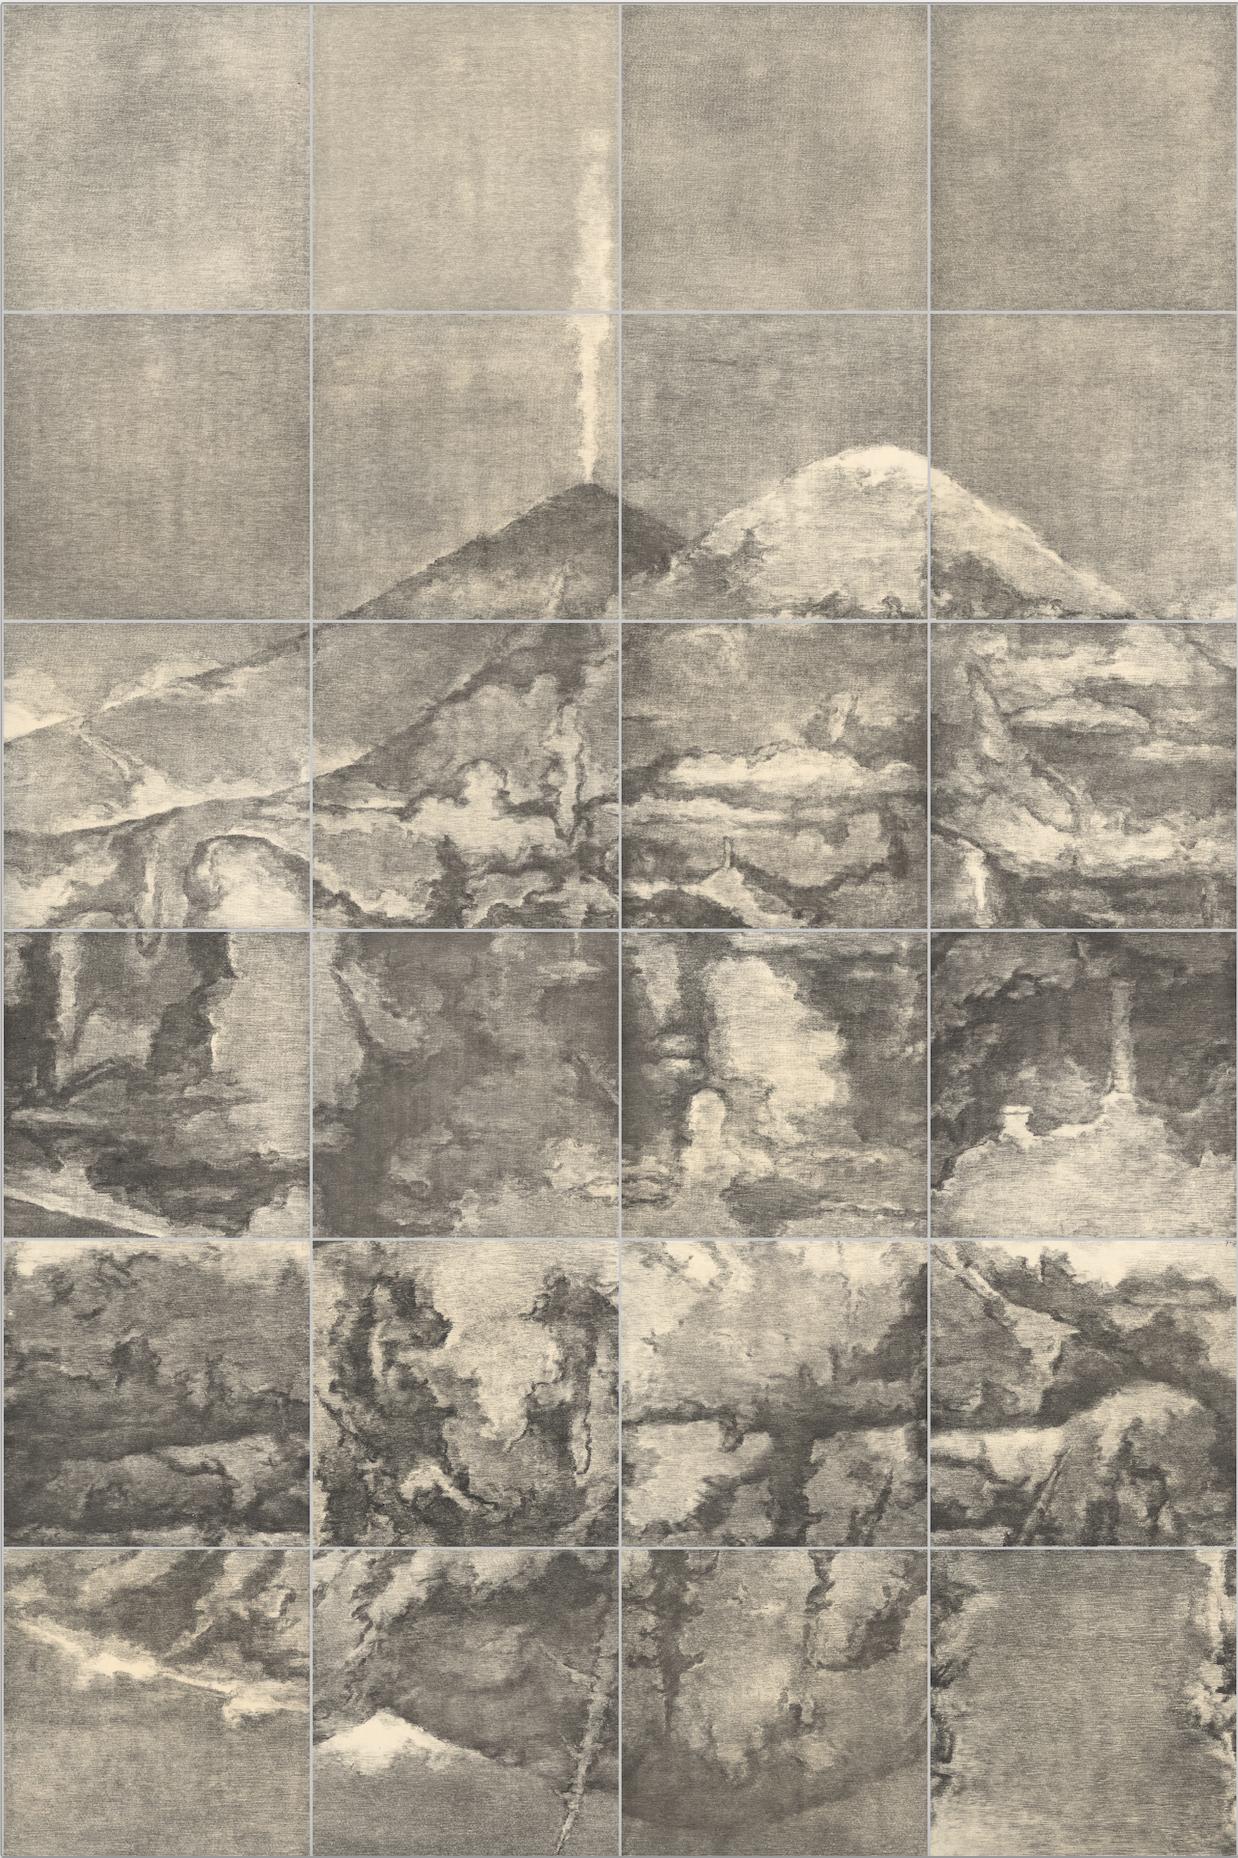 荒原3号 The Waste Land NO.3 苏新平 Su Xinping 铜版画 Copperplate Etching 300×200cm.png